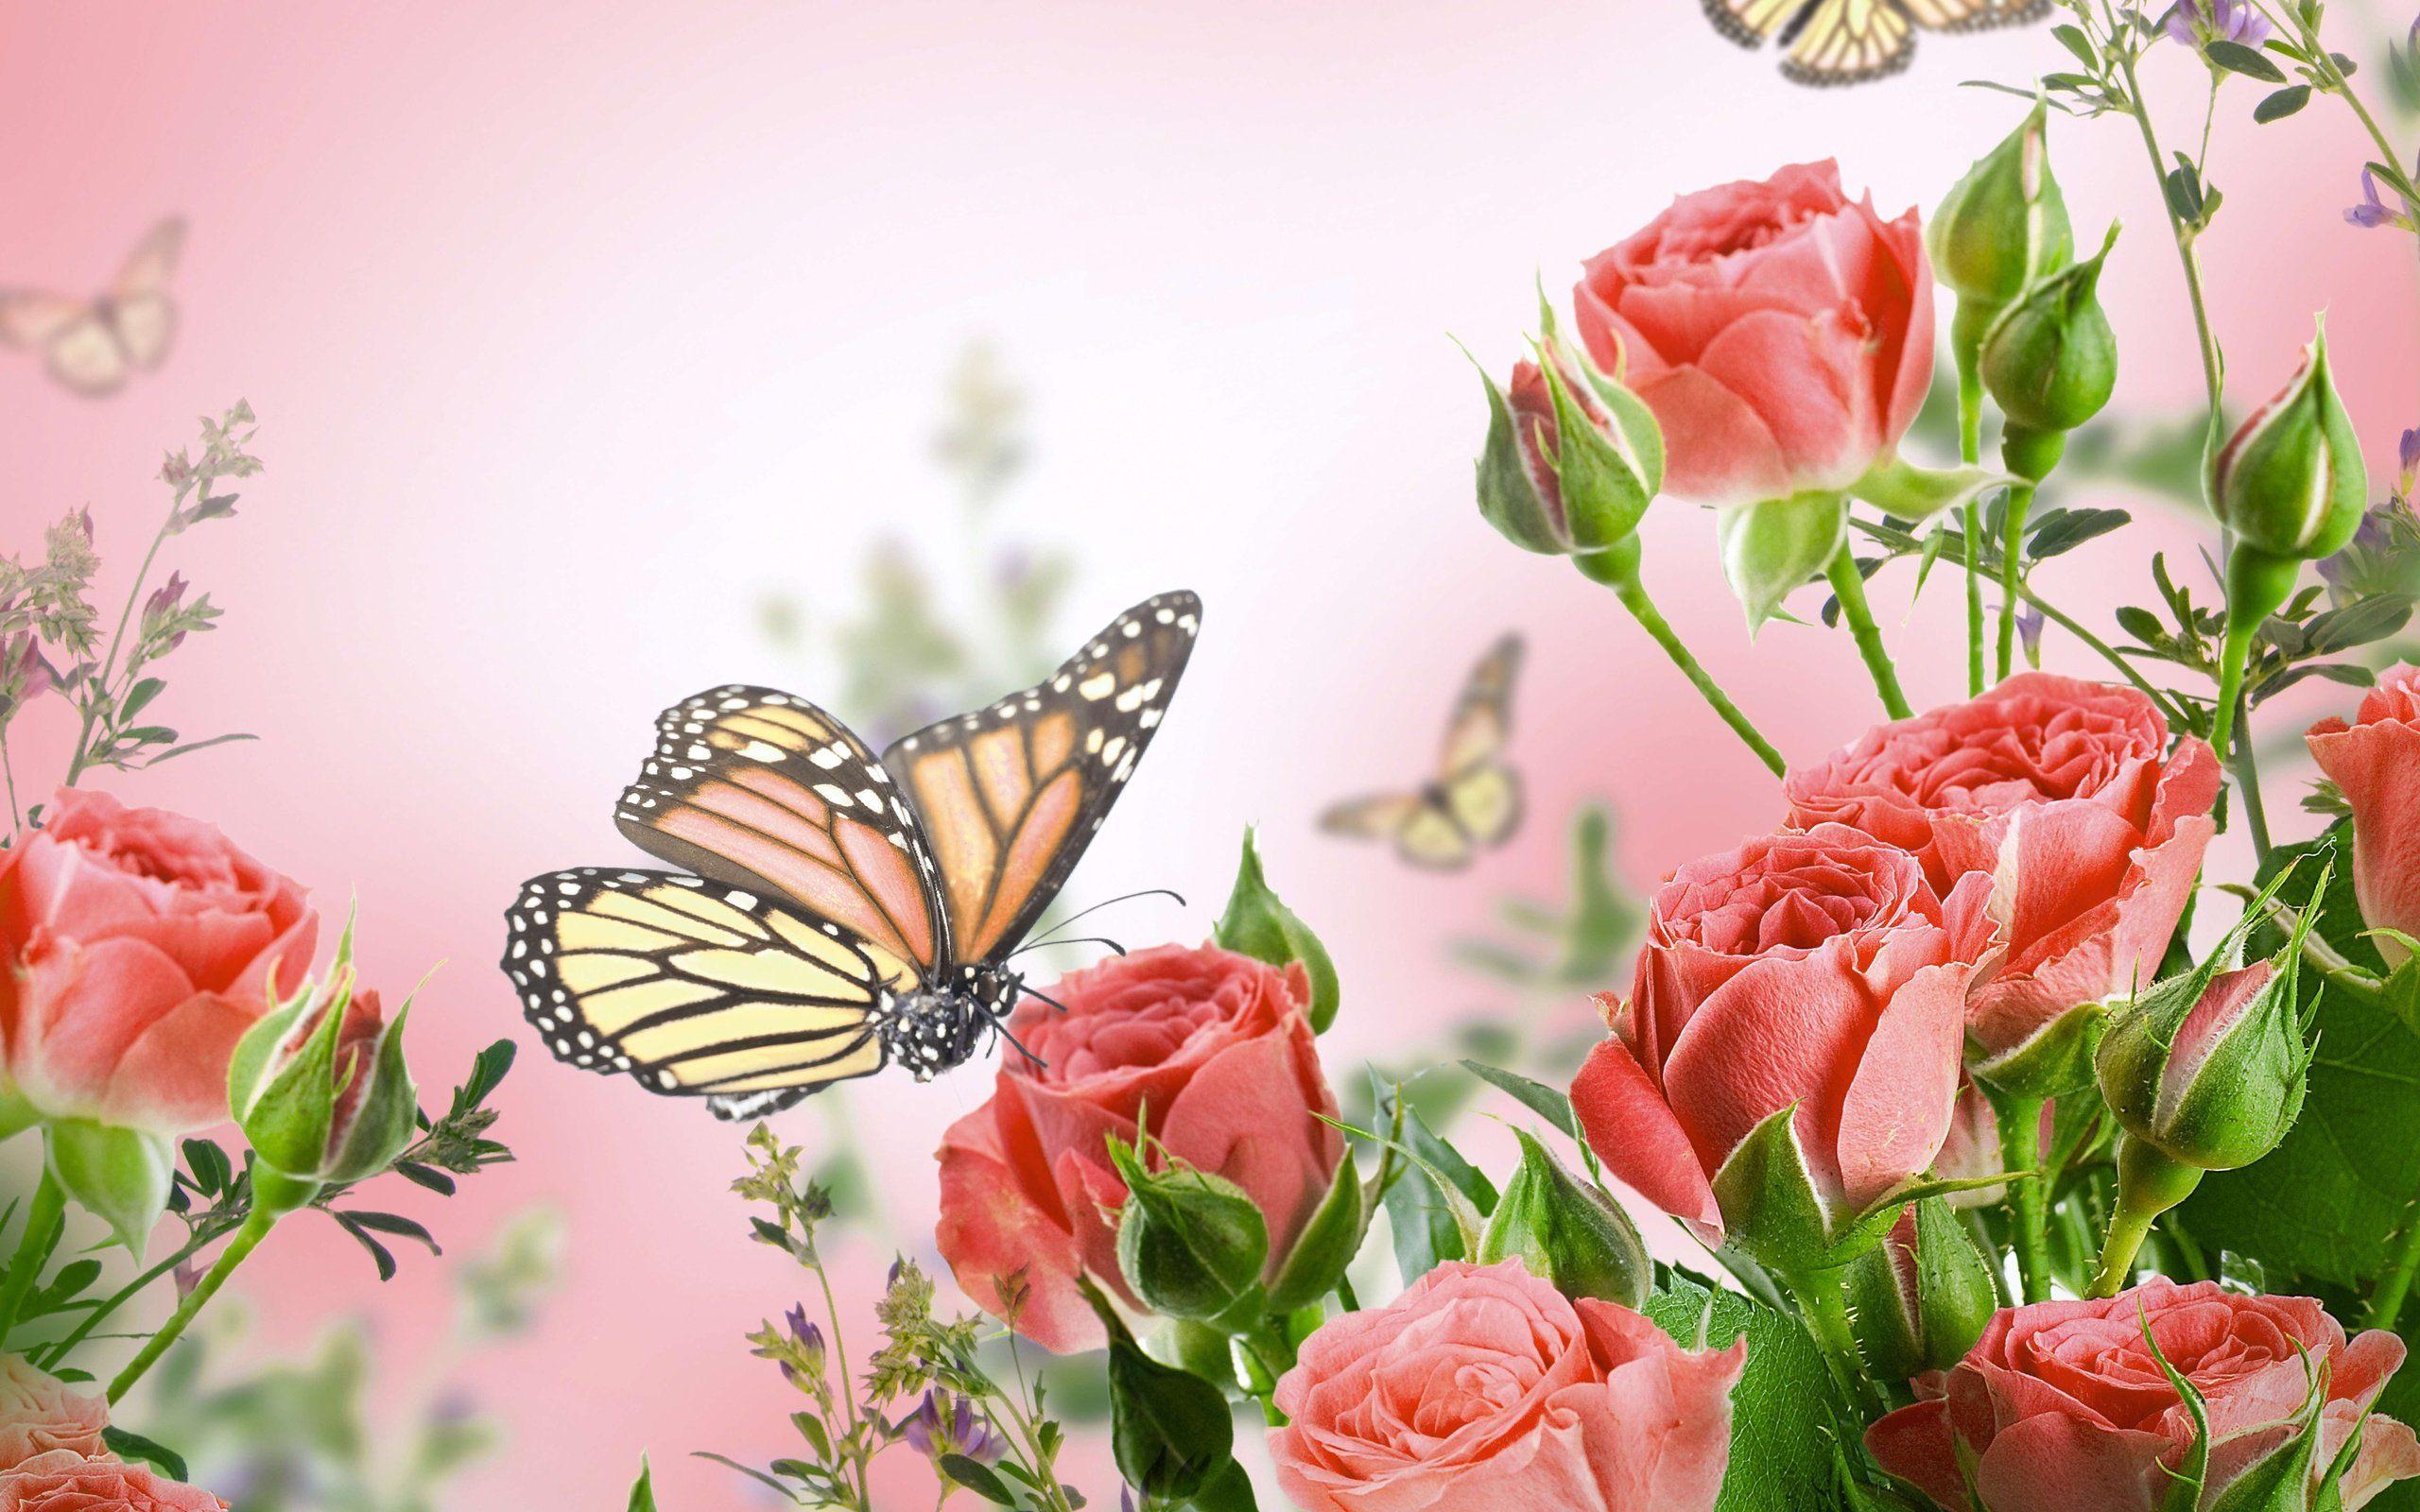 Wallpaper beautiful flower red rose butterfly bokeh buds wallpaper beautiful flower red rose butterfly bokeh buds izmirmasajfo